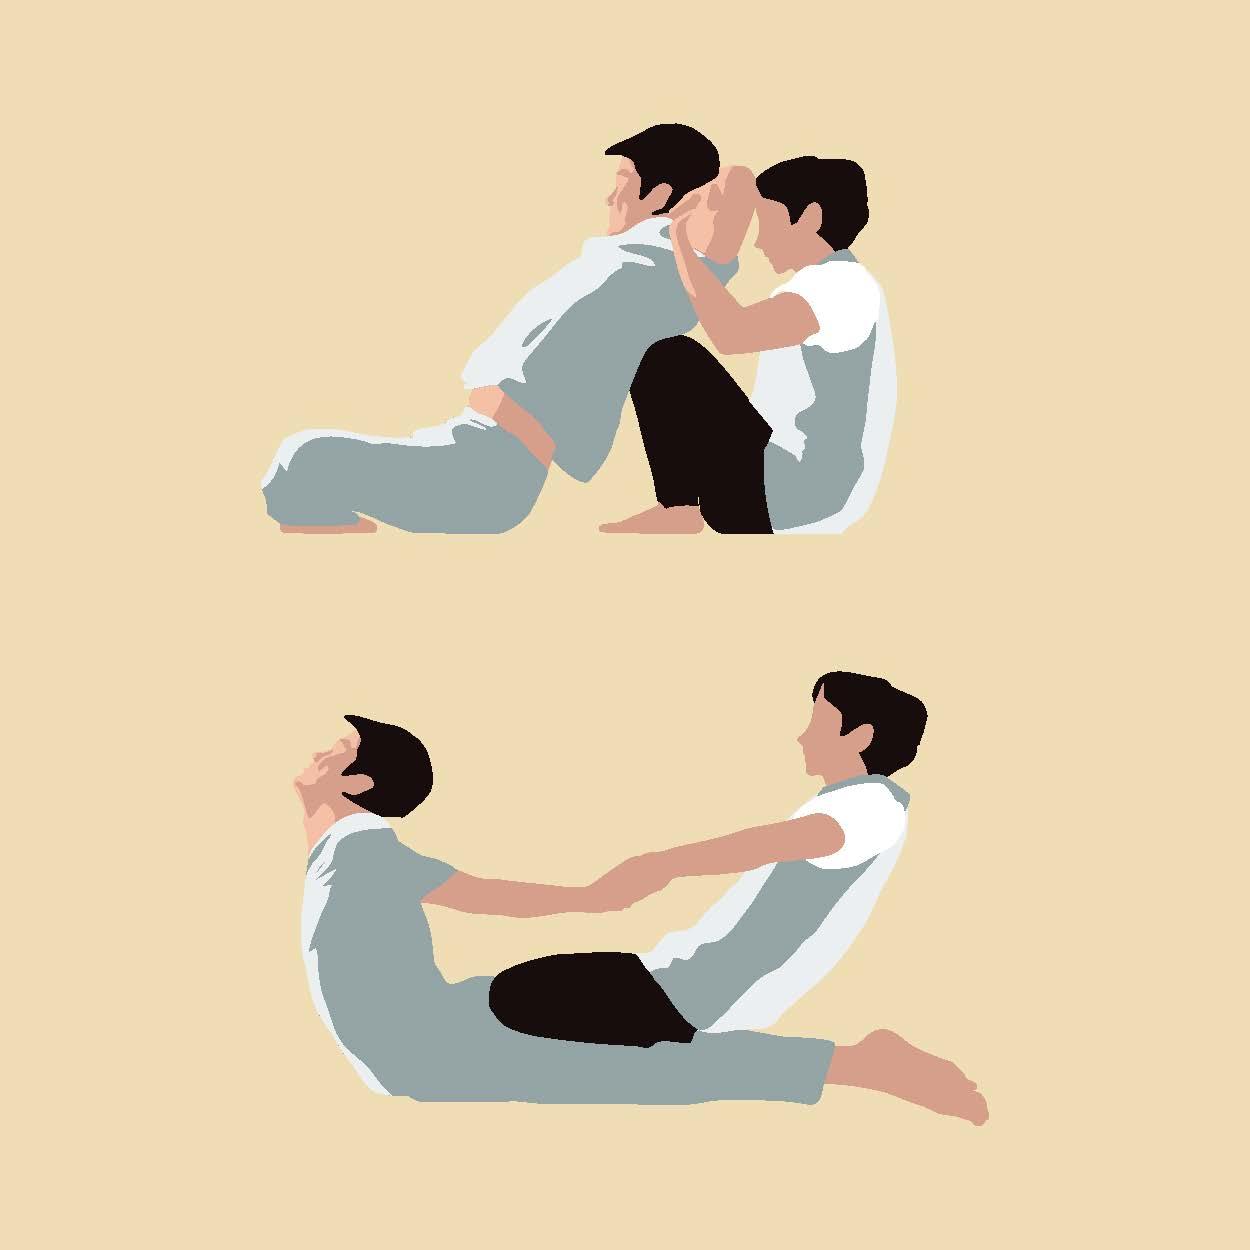 Siskiyou Massage Thai Massage Bodywork - Siskiyou Massage